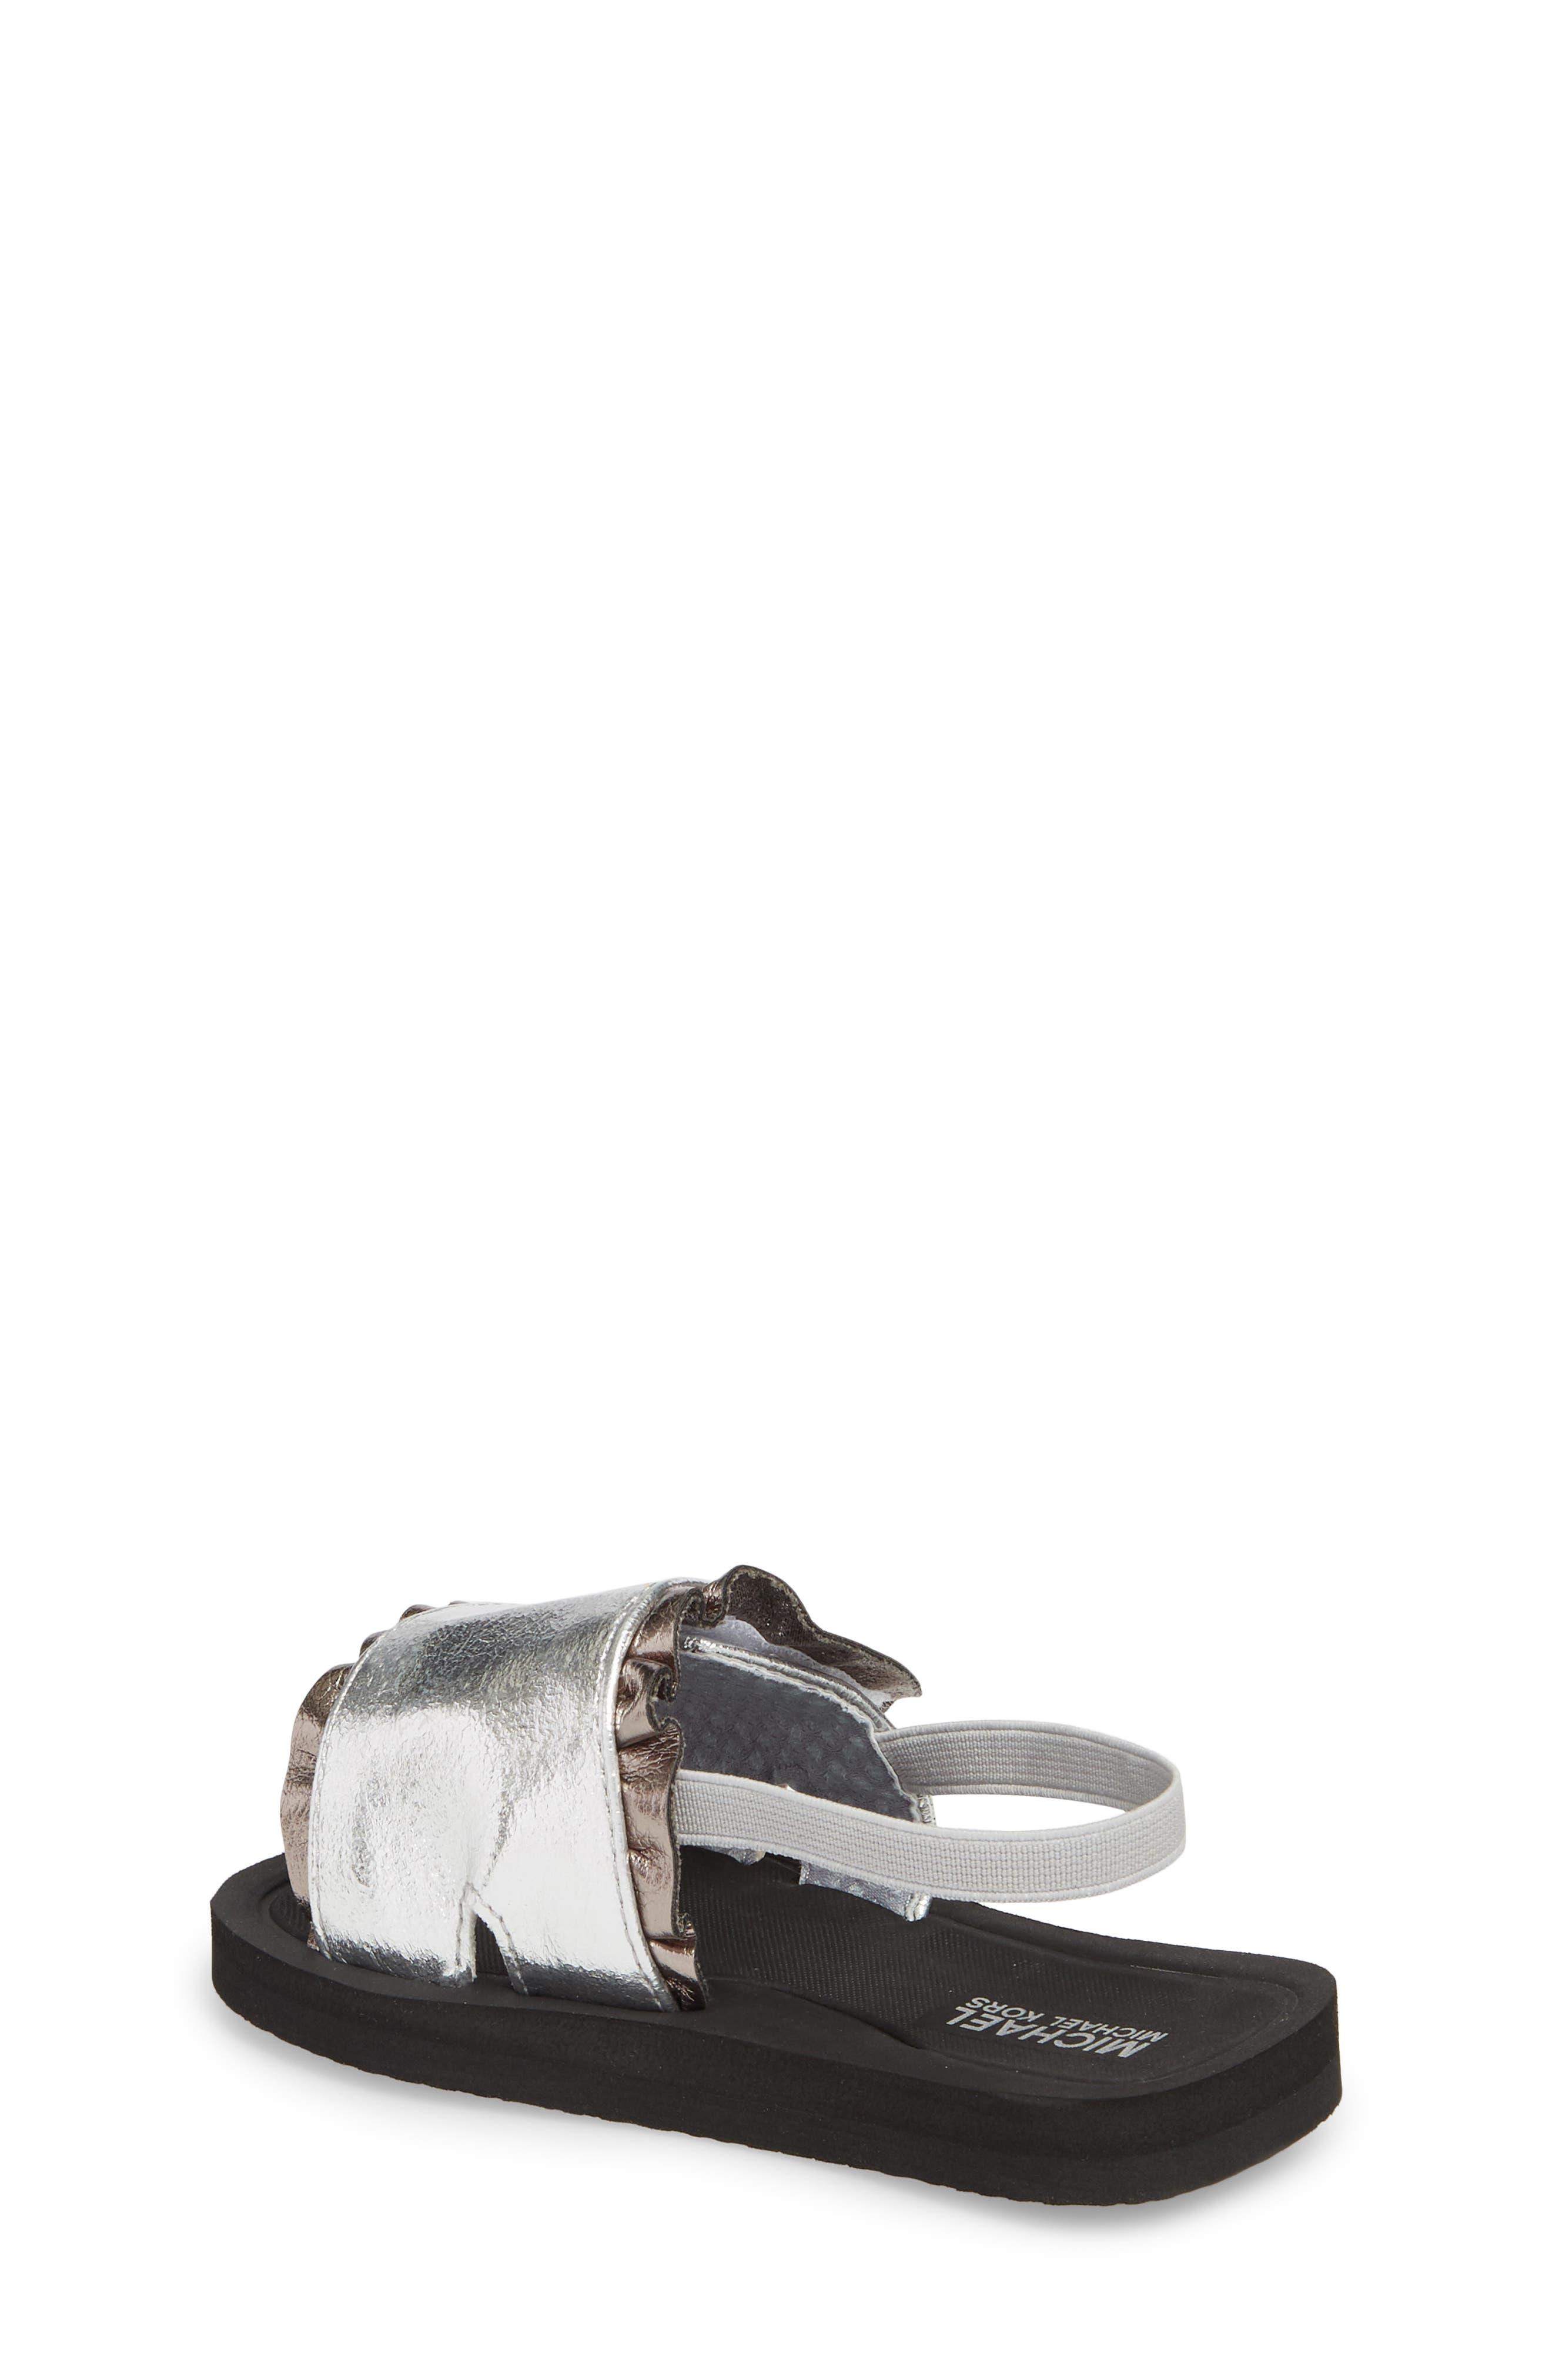 Eli Jack Metallic Sandal,                             Alternate thumbnail 2, color,                             Silver